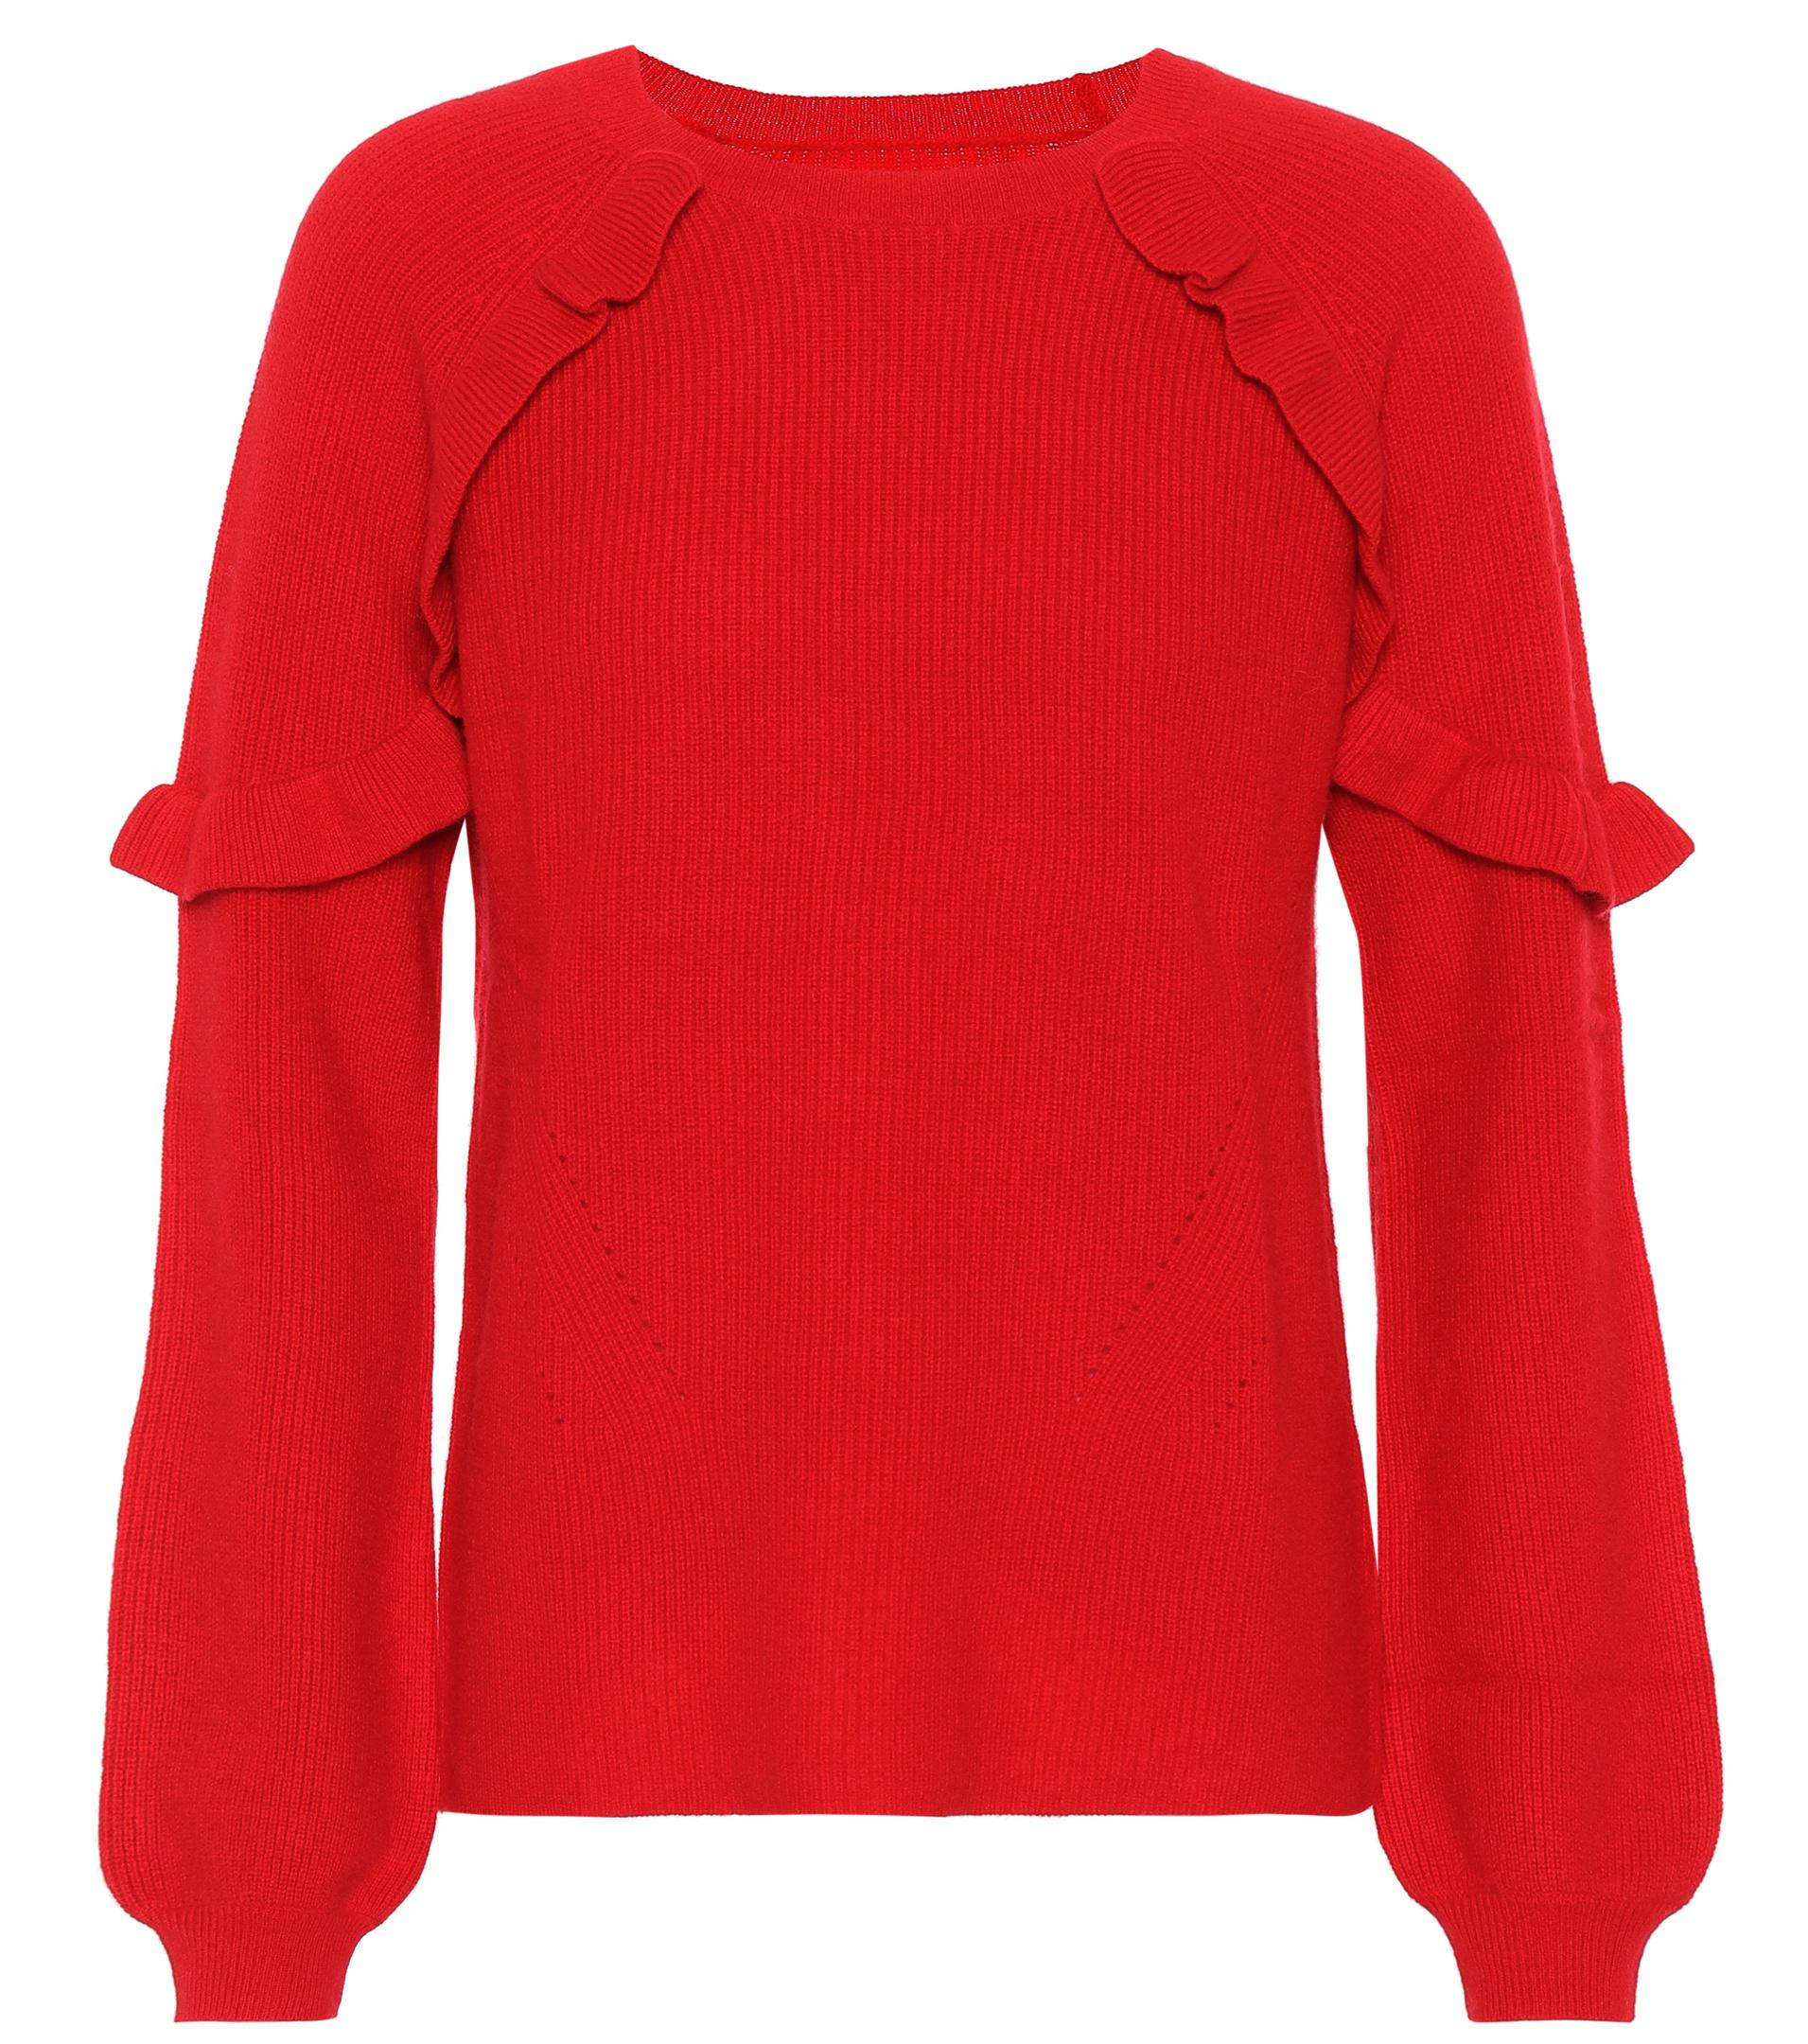 Velvet Dane Cashmere Sweater in Red | Lyst